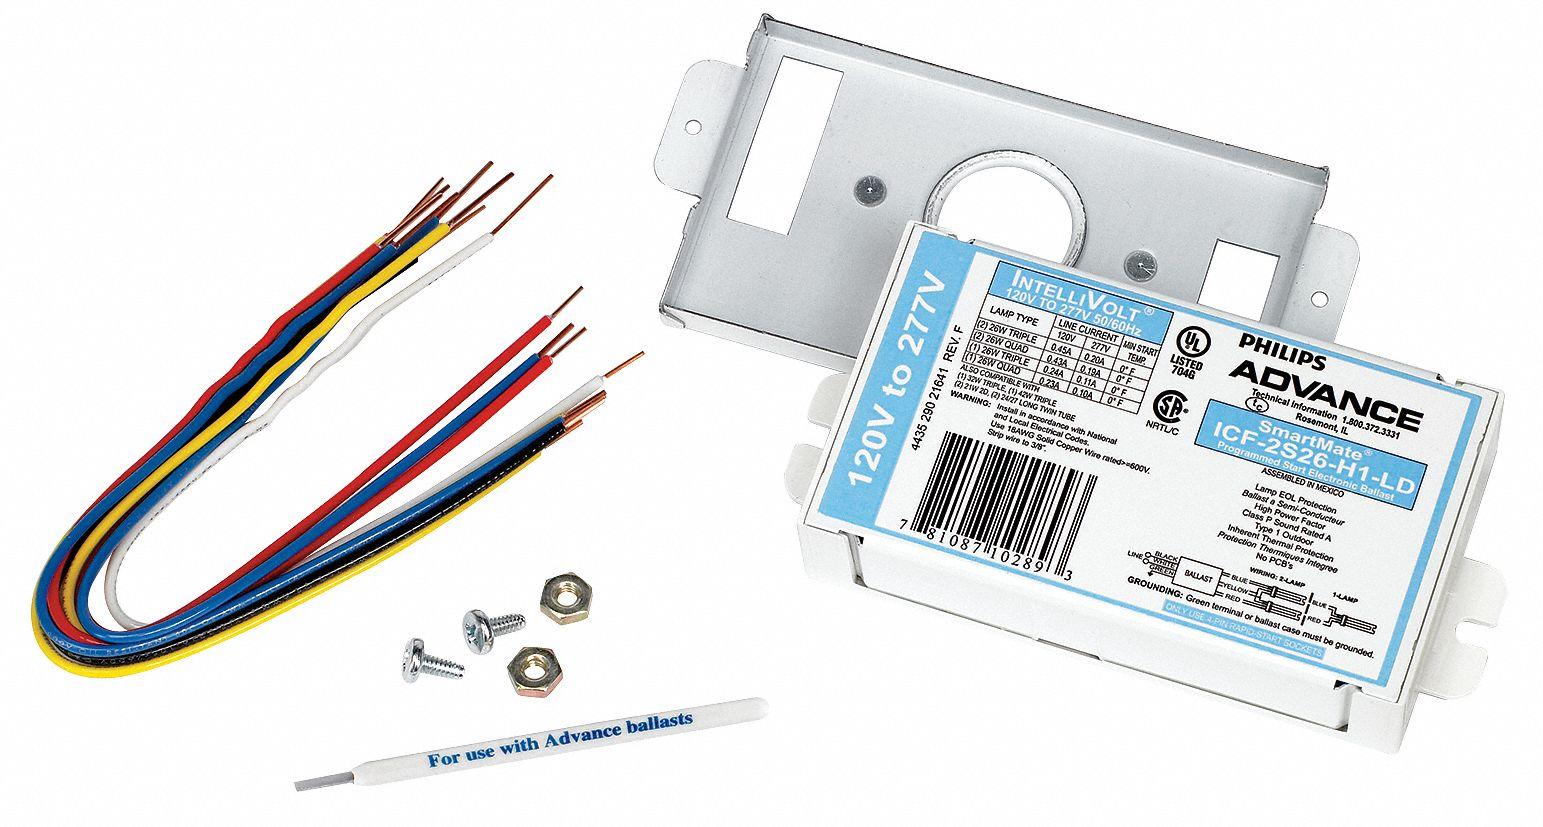 hight resolution of ballast wiring tools wiring diagram online hid ballast wiring ballast wiring tools